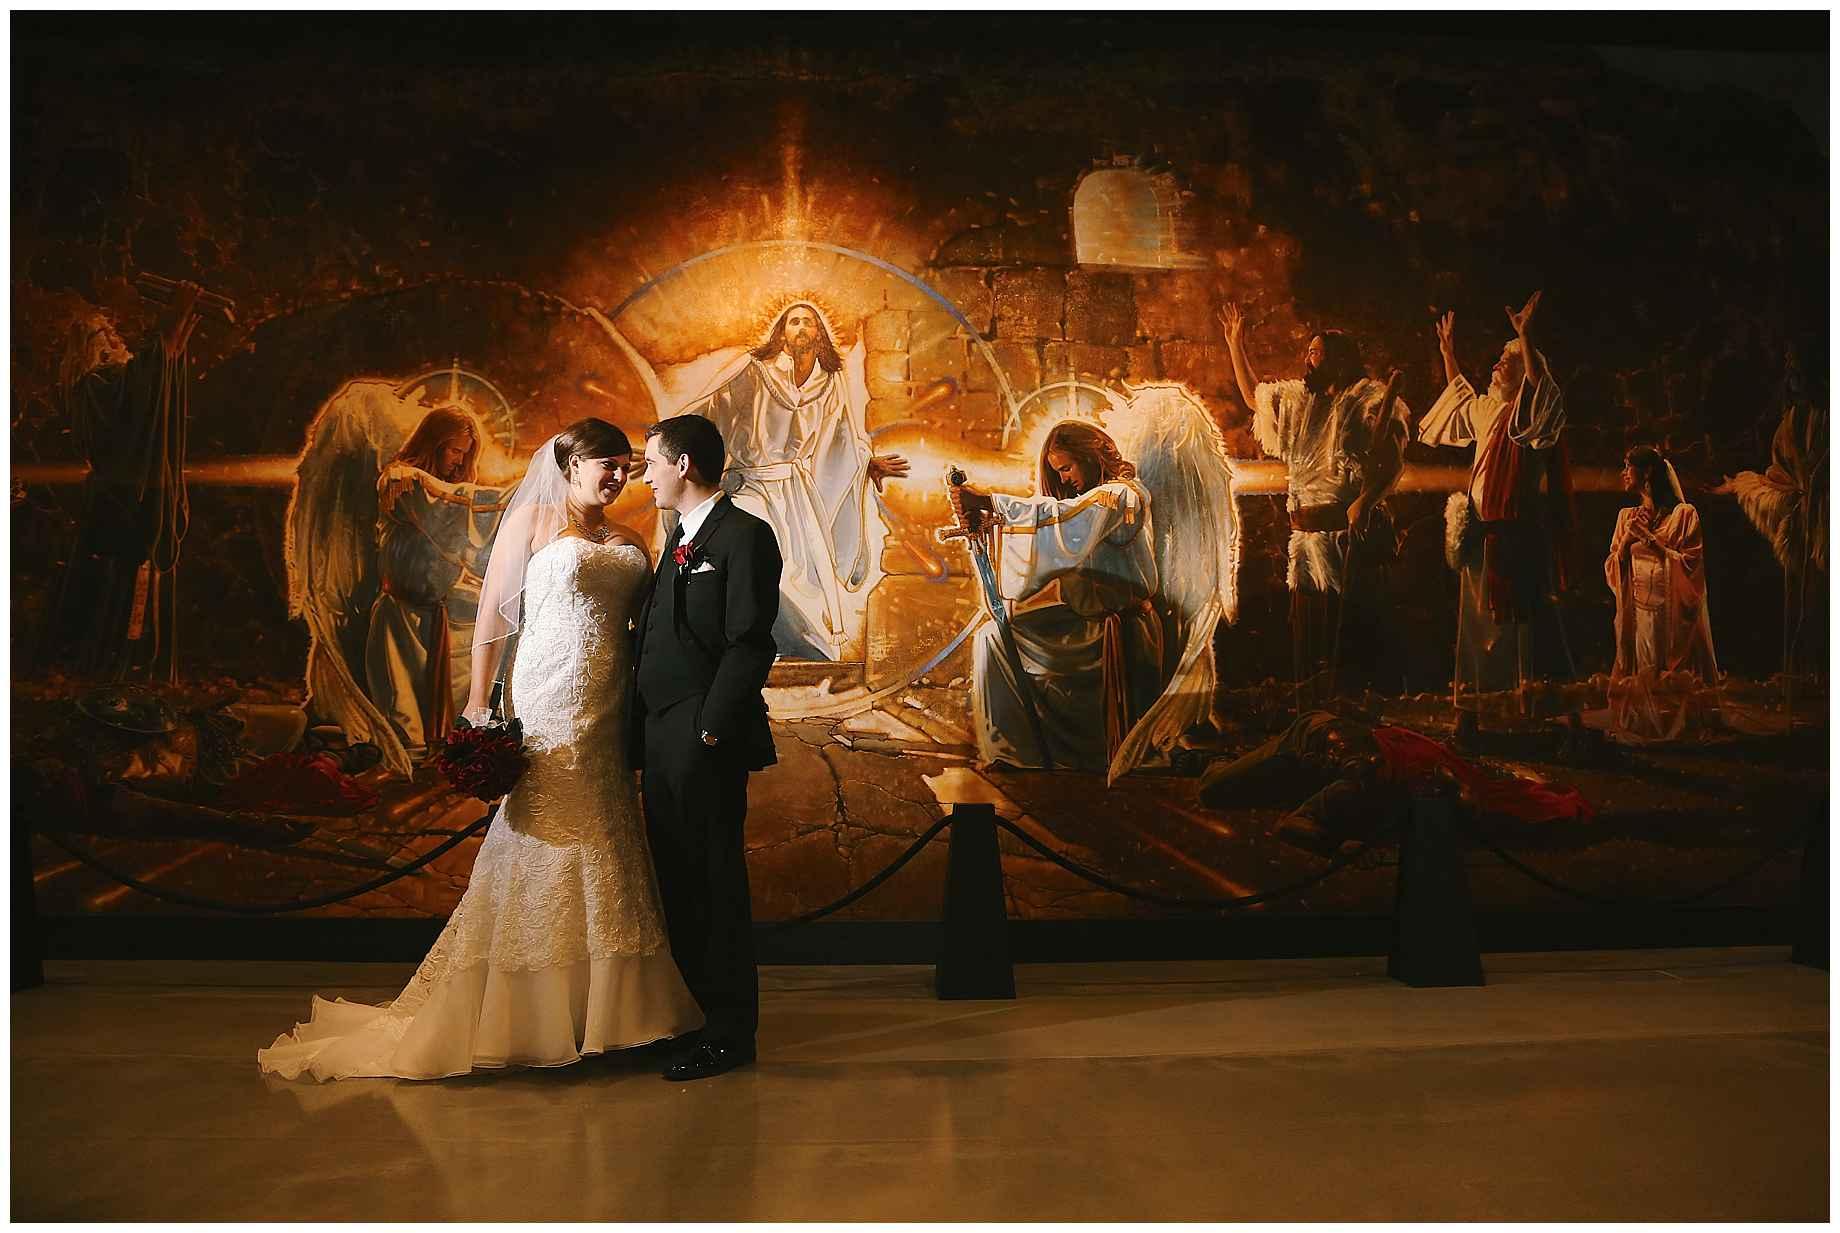 museum-of-biblical-art-wedding-photos-06